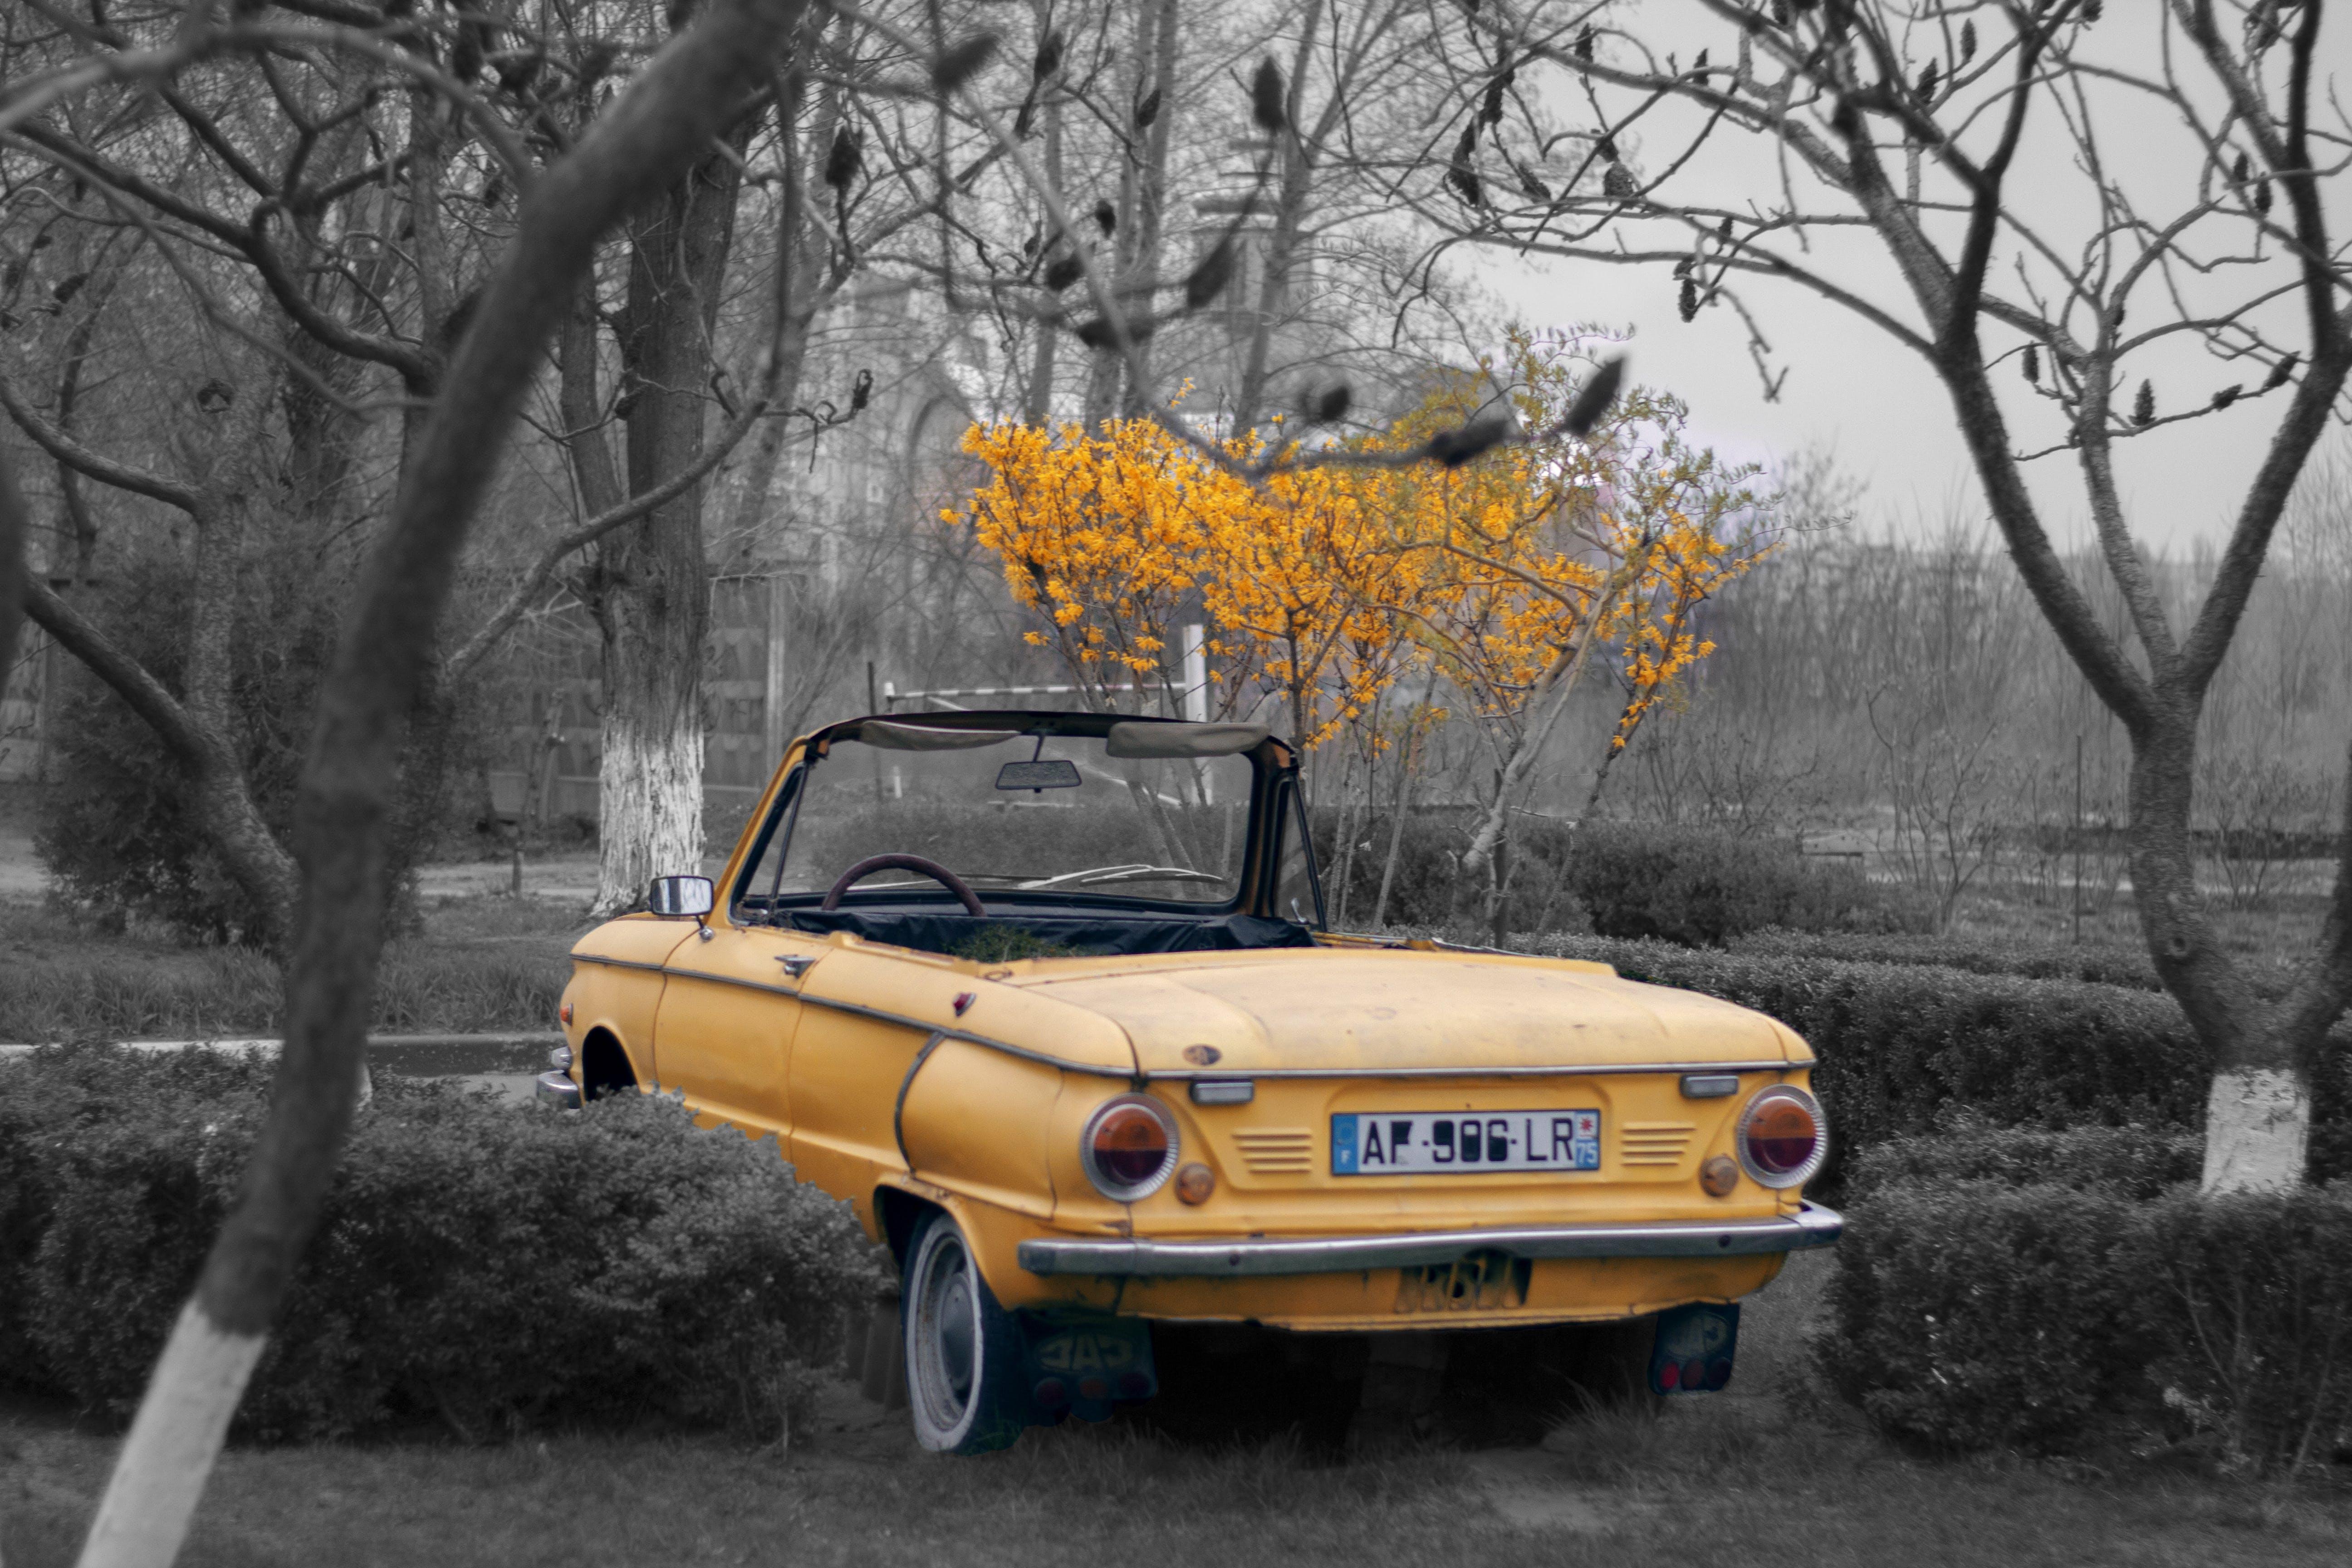 Free stock photo of #mobilechallenge, #Tree, auto, beautiful